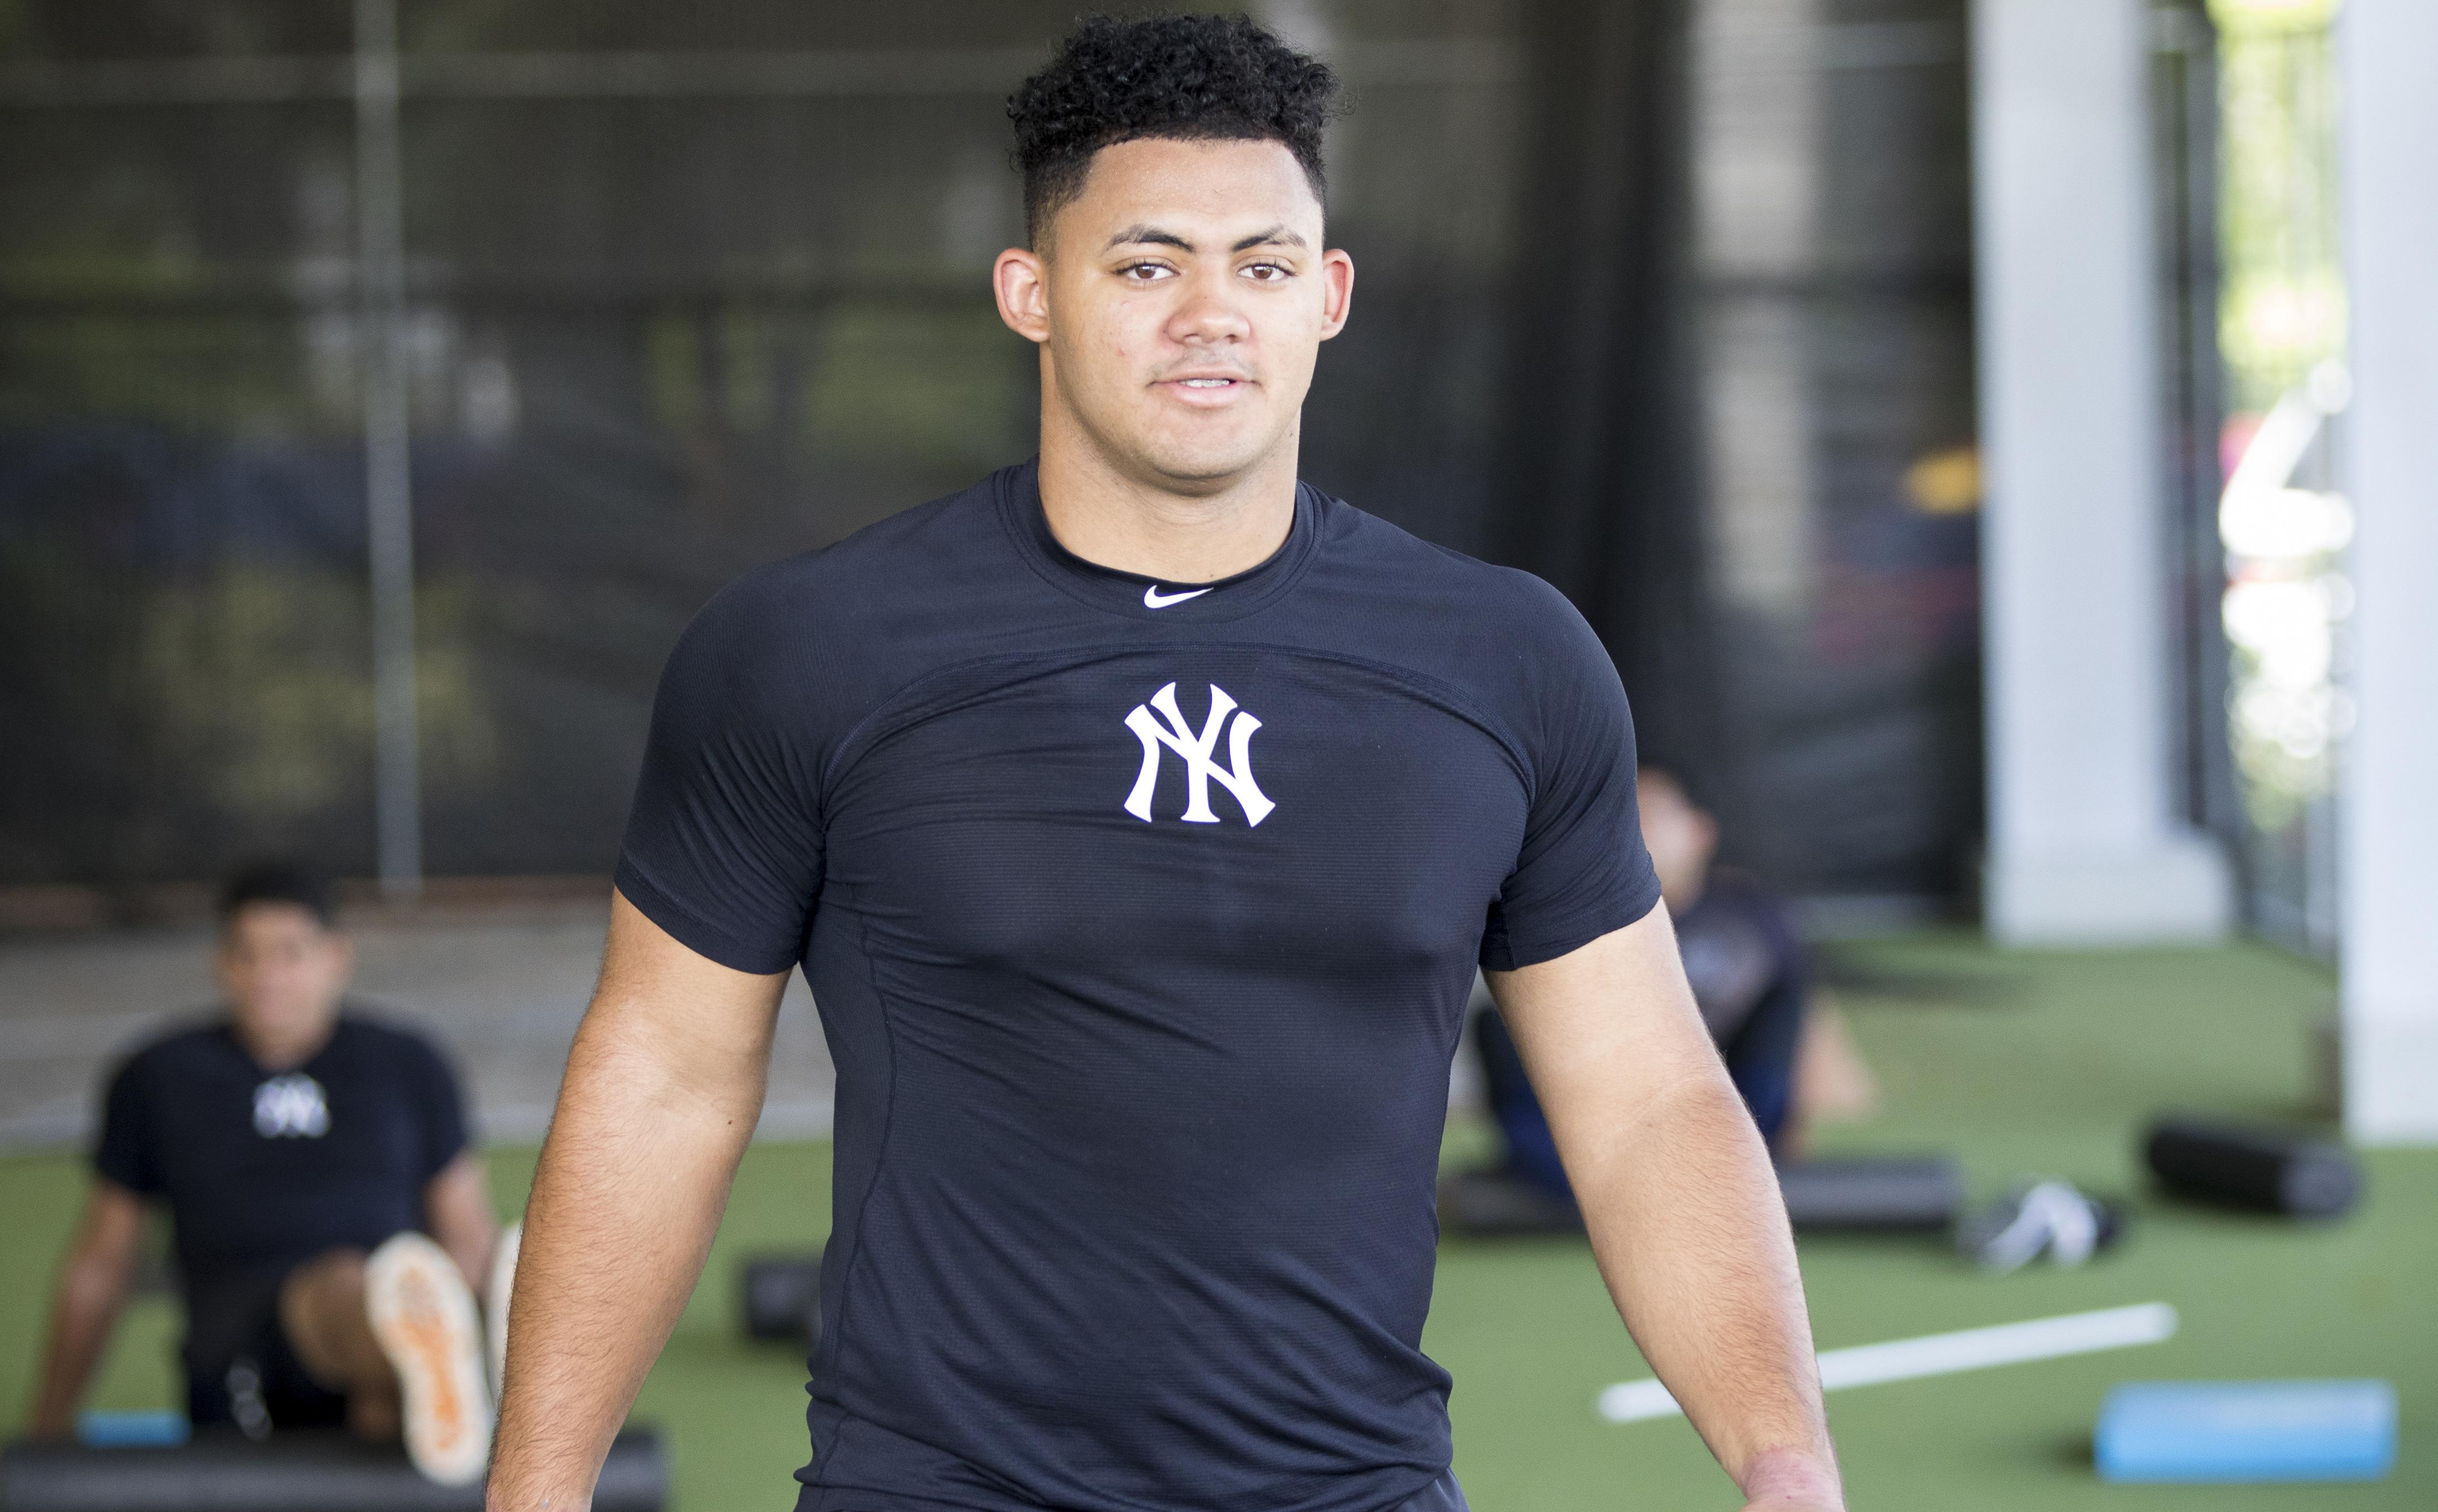 Yankees' top prospect Jasson Dominguez 'more advanced than Mike Trout at  same age' - nj.com